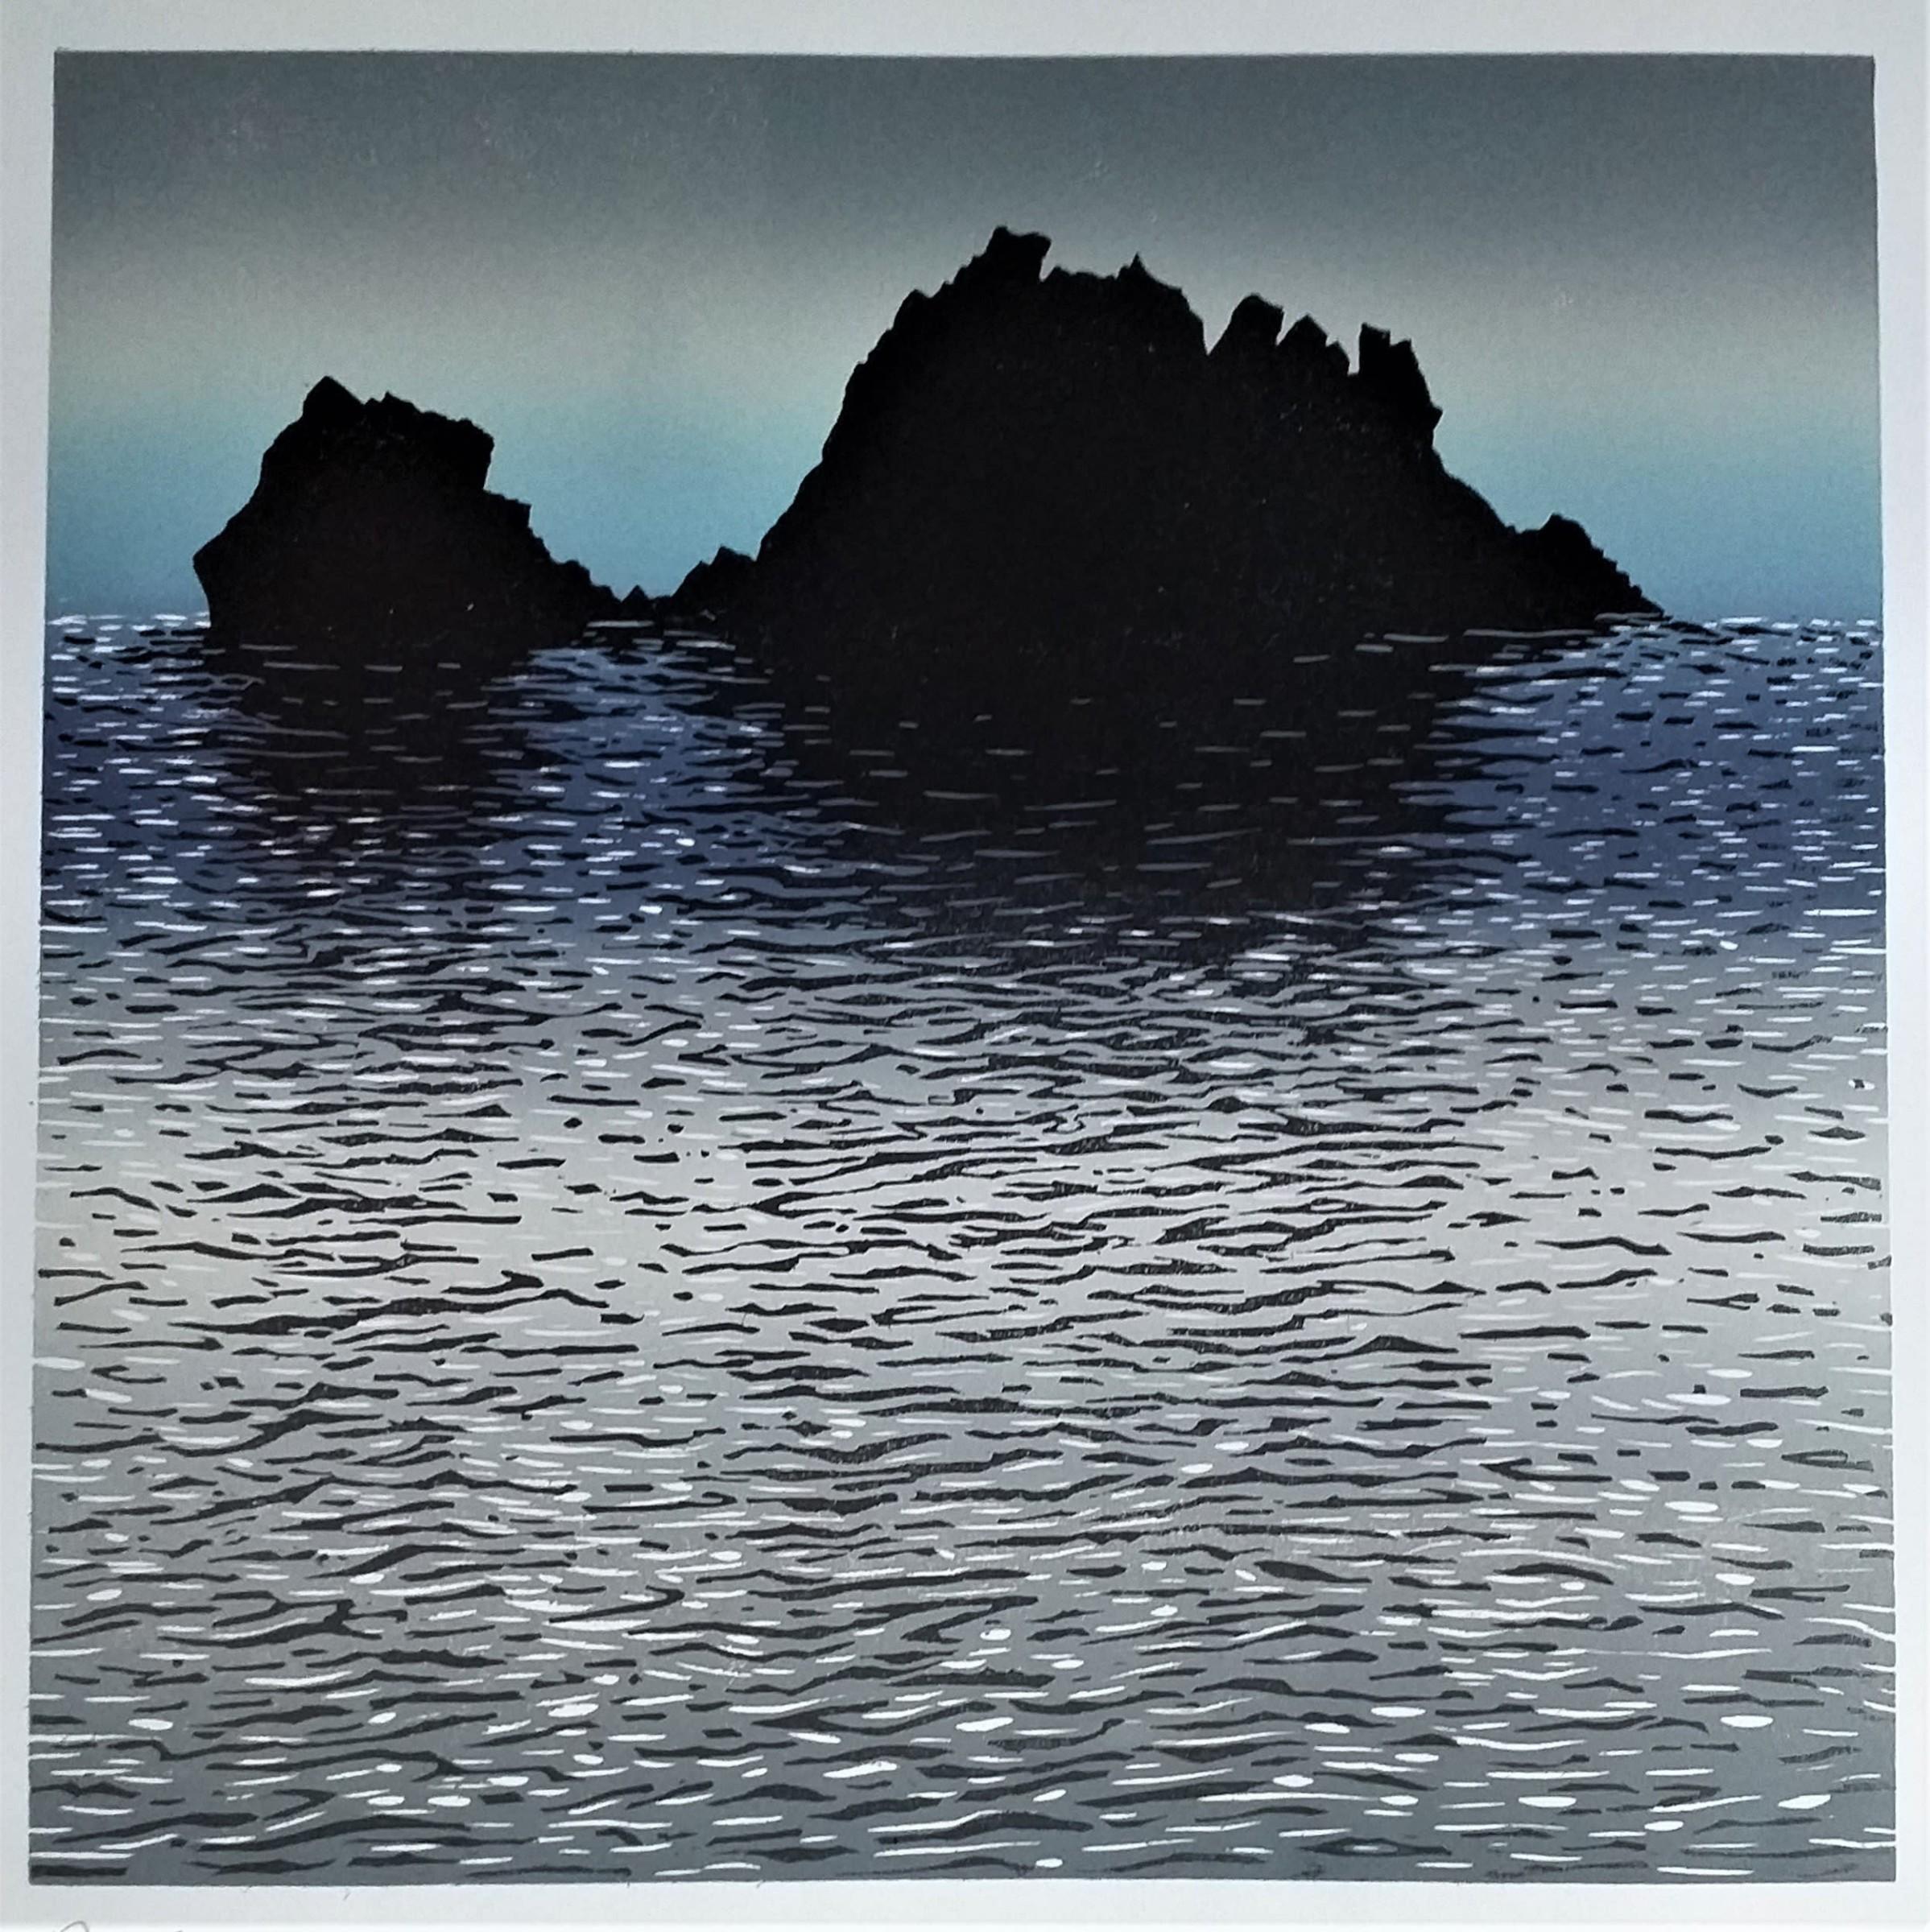 "<span class=""link fancybox-details-link""><a href=""/exhibitions/22/works/artworks_standalone11078/"">View Detail Page</a></span><div class=""artist""><span class=""artist""><strong>Merlyn Chesterman RE</strong></span></div><div class=""title""><em>Sea Slight</em></div><div class=""medium"">woodcut</div><div class=""dimensions"">68 x 63 cm framed<br>42 x 42 cm image size</div><div class=""edition_details"">edition of 50</div>"